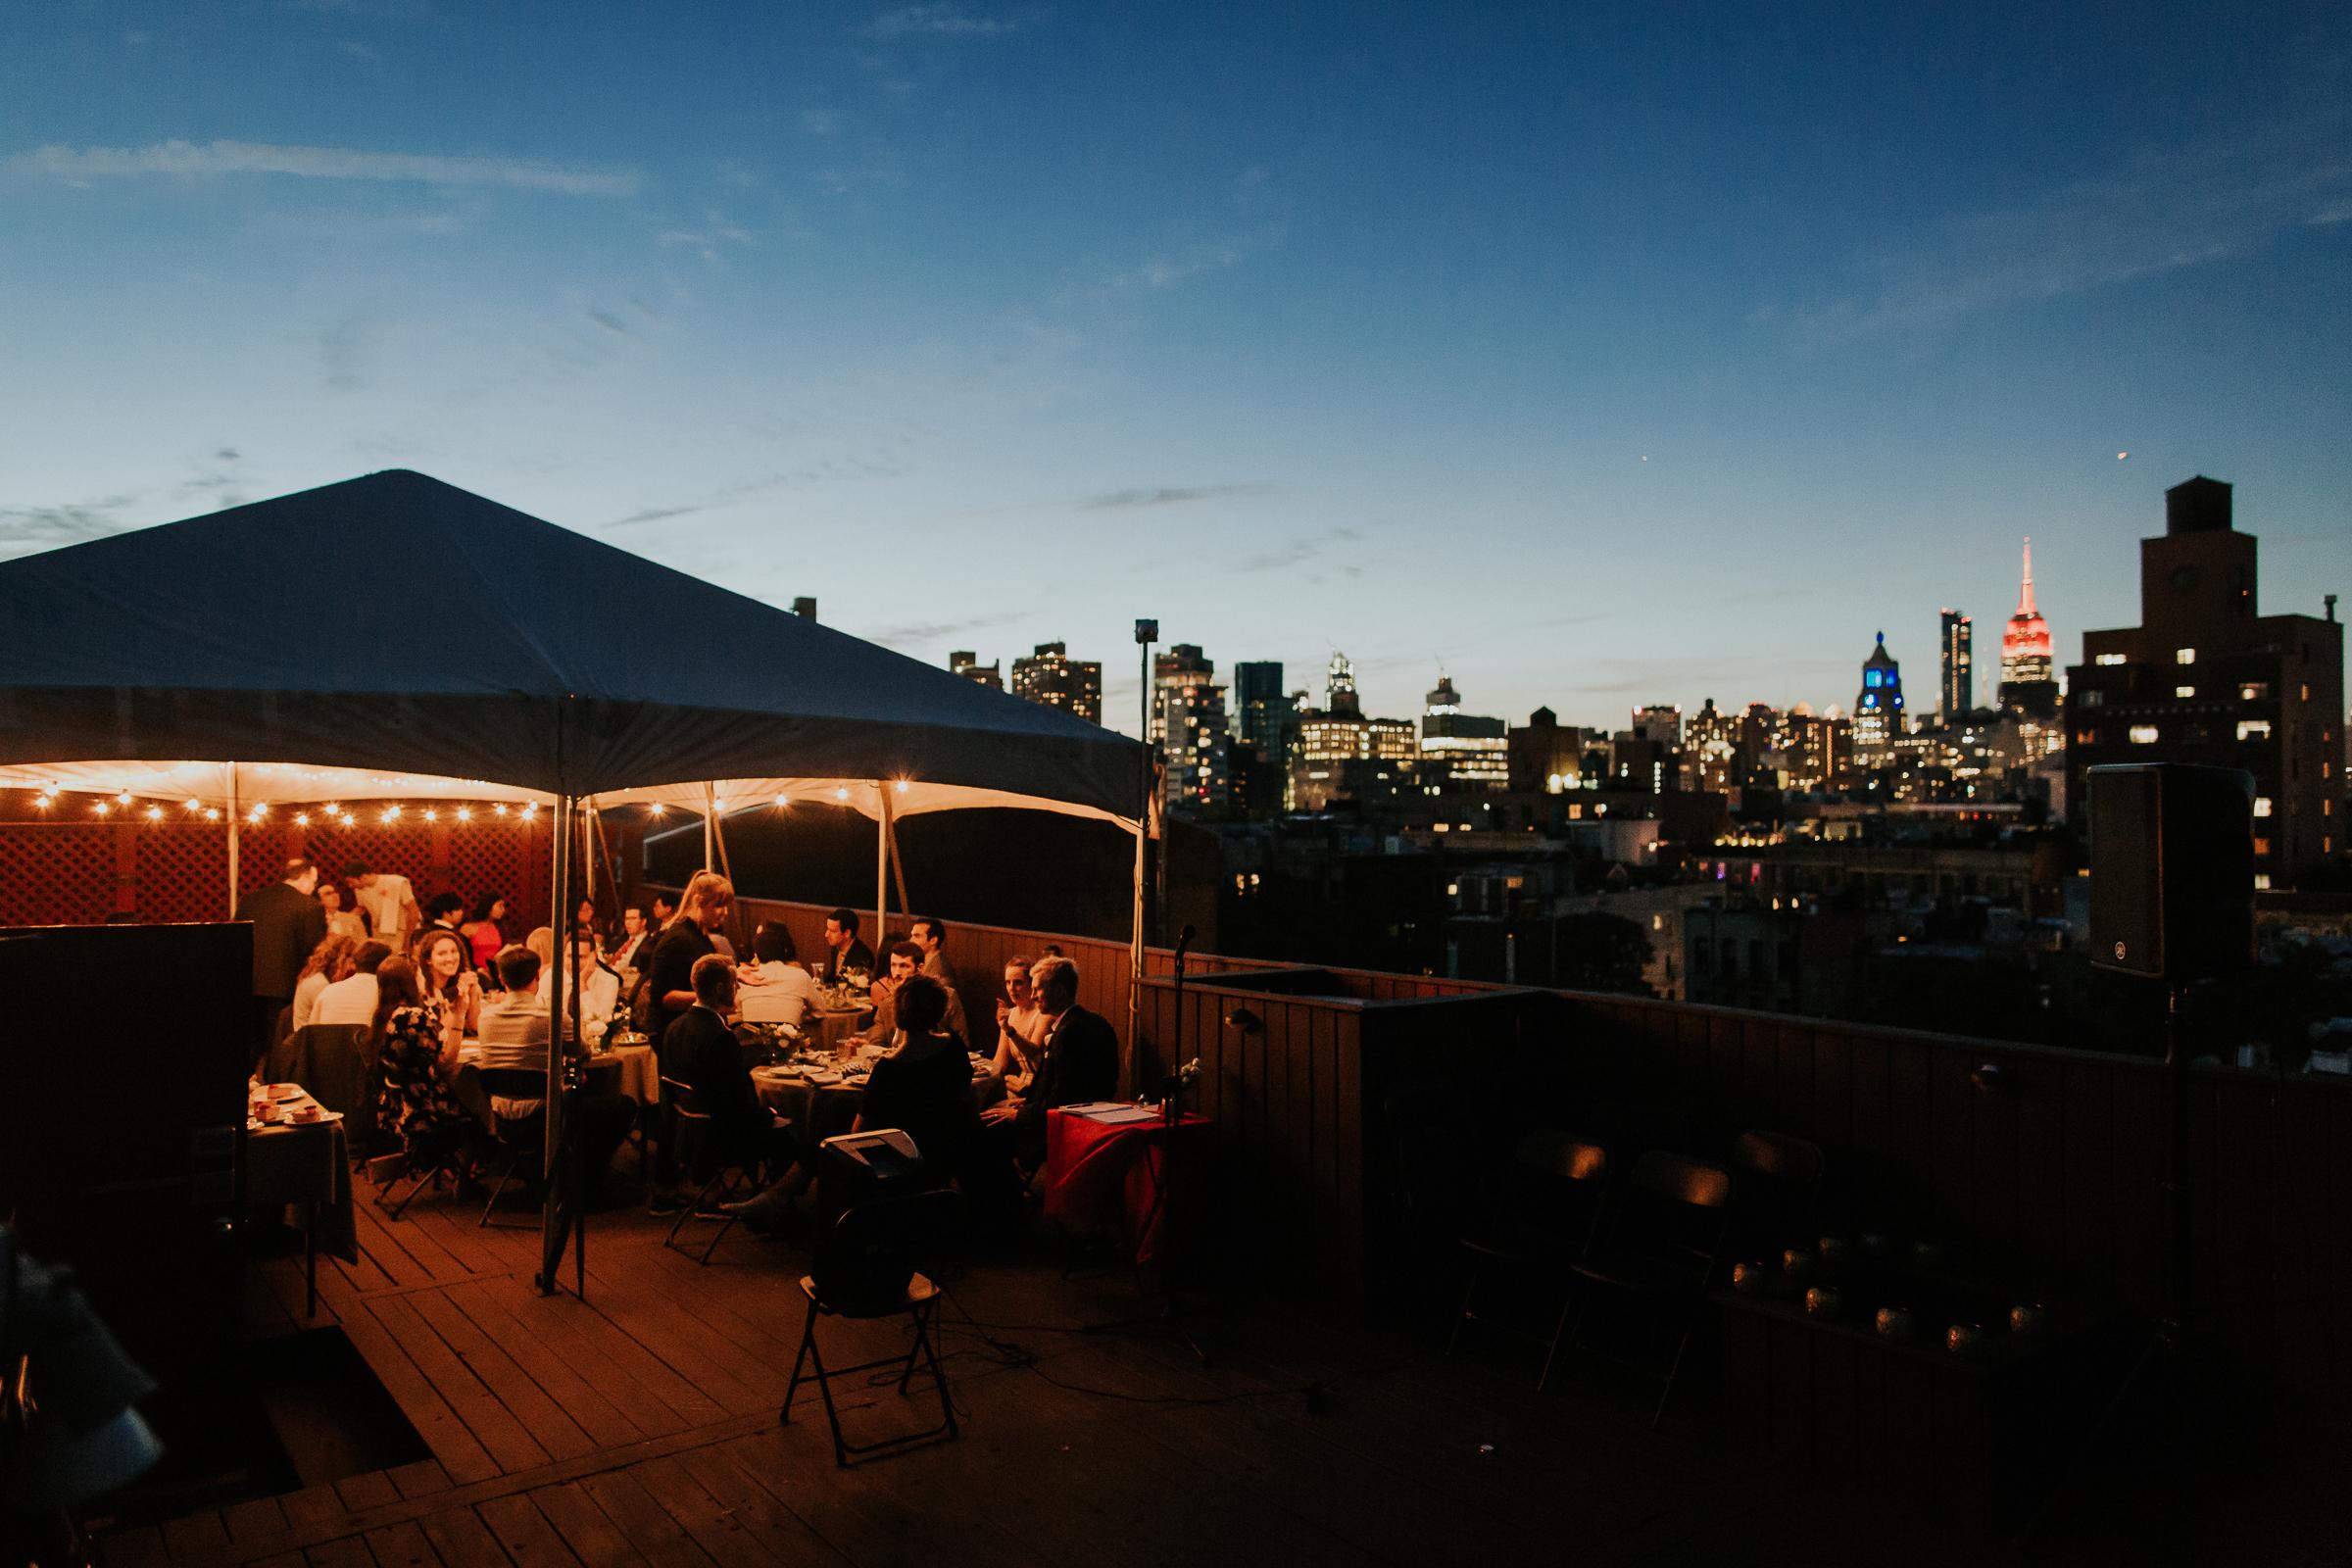 The-Bhakti-Center-Yoga-NYC-Rooftop-Documentary-Wedding-Photographer-65.jpg